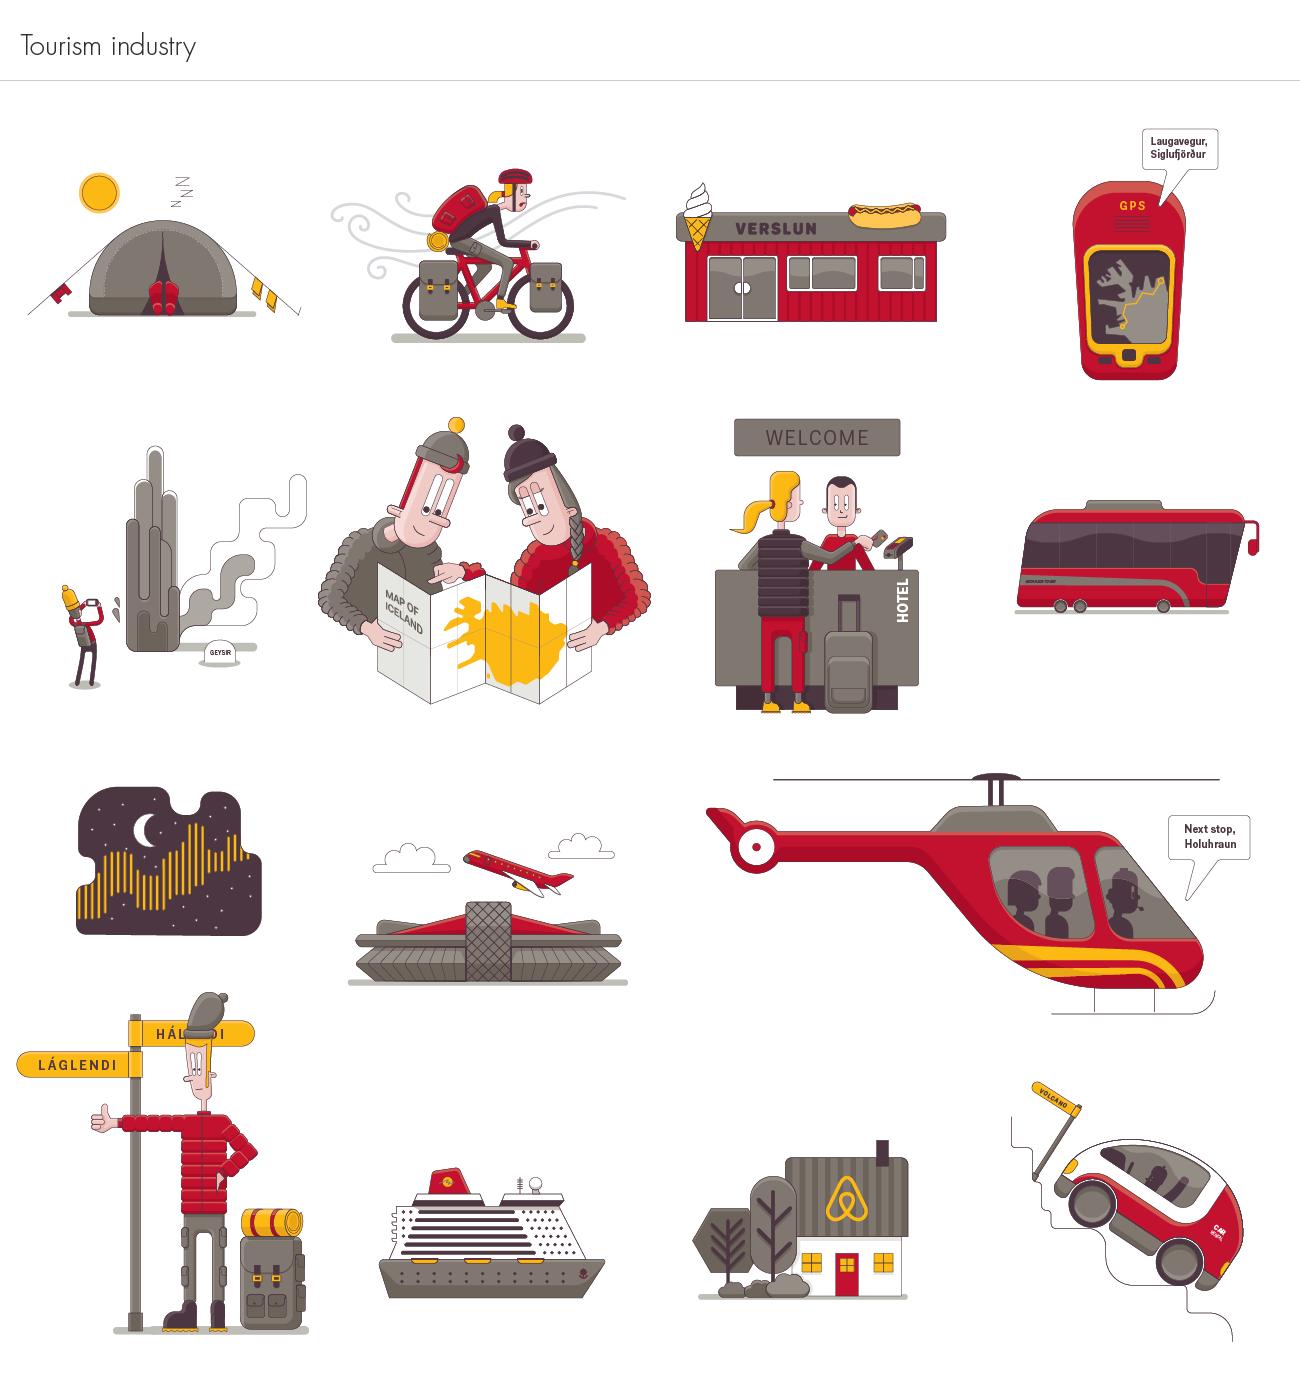 Íslandsbanki Tourism illustrations